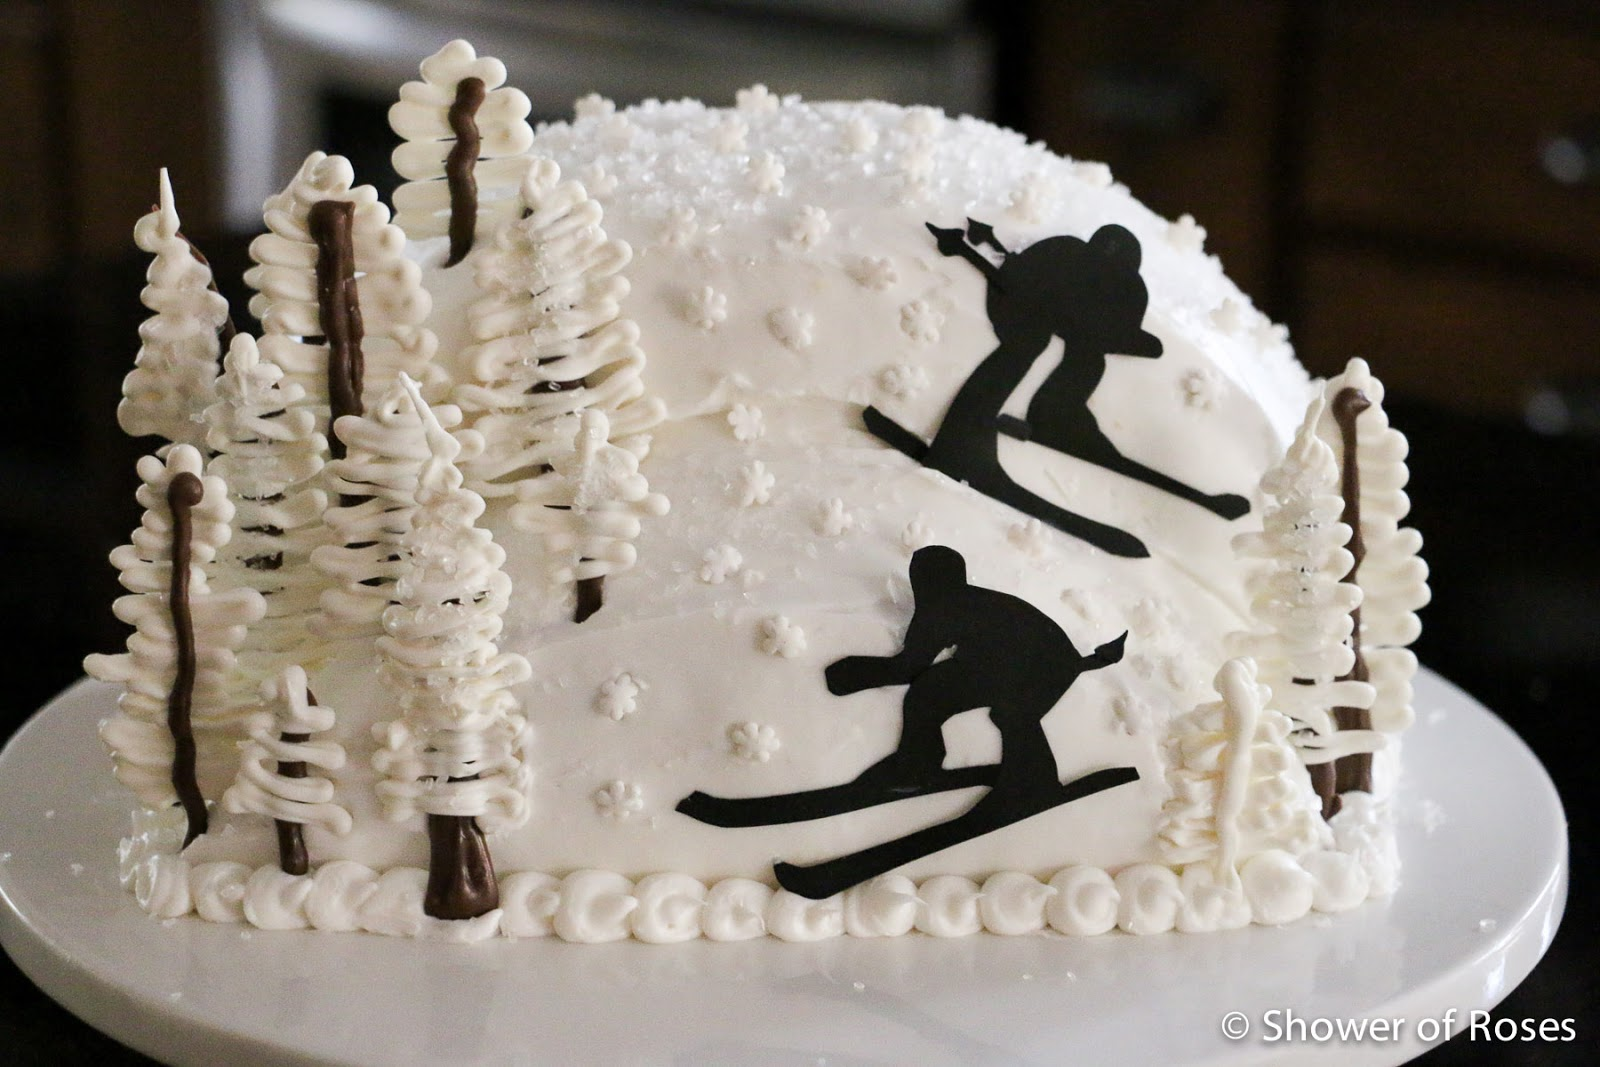 Shower of Roses: Snowy Mountain Ski Resort Birthday Cake - photo#33